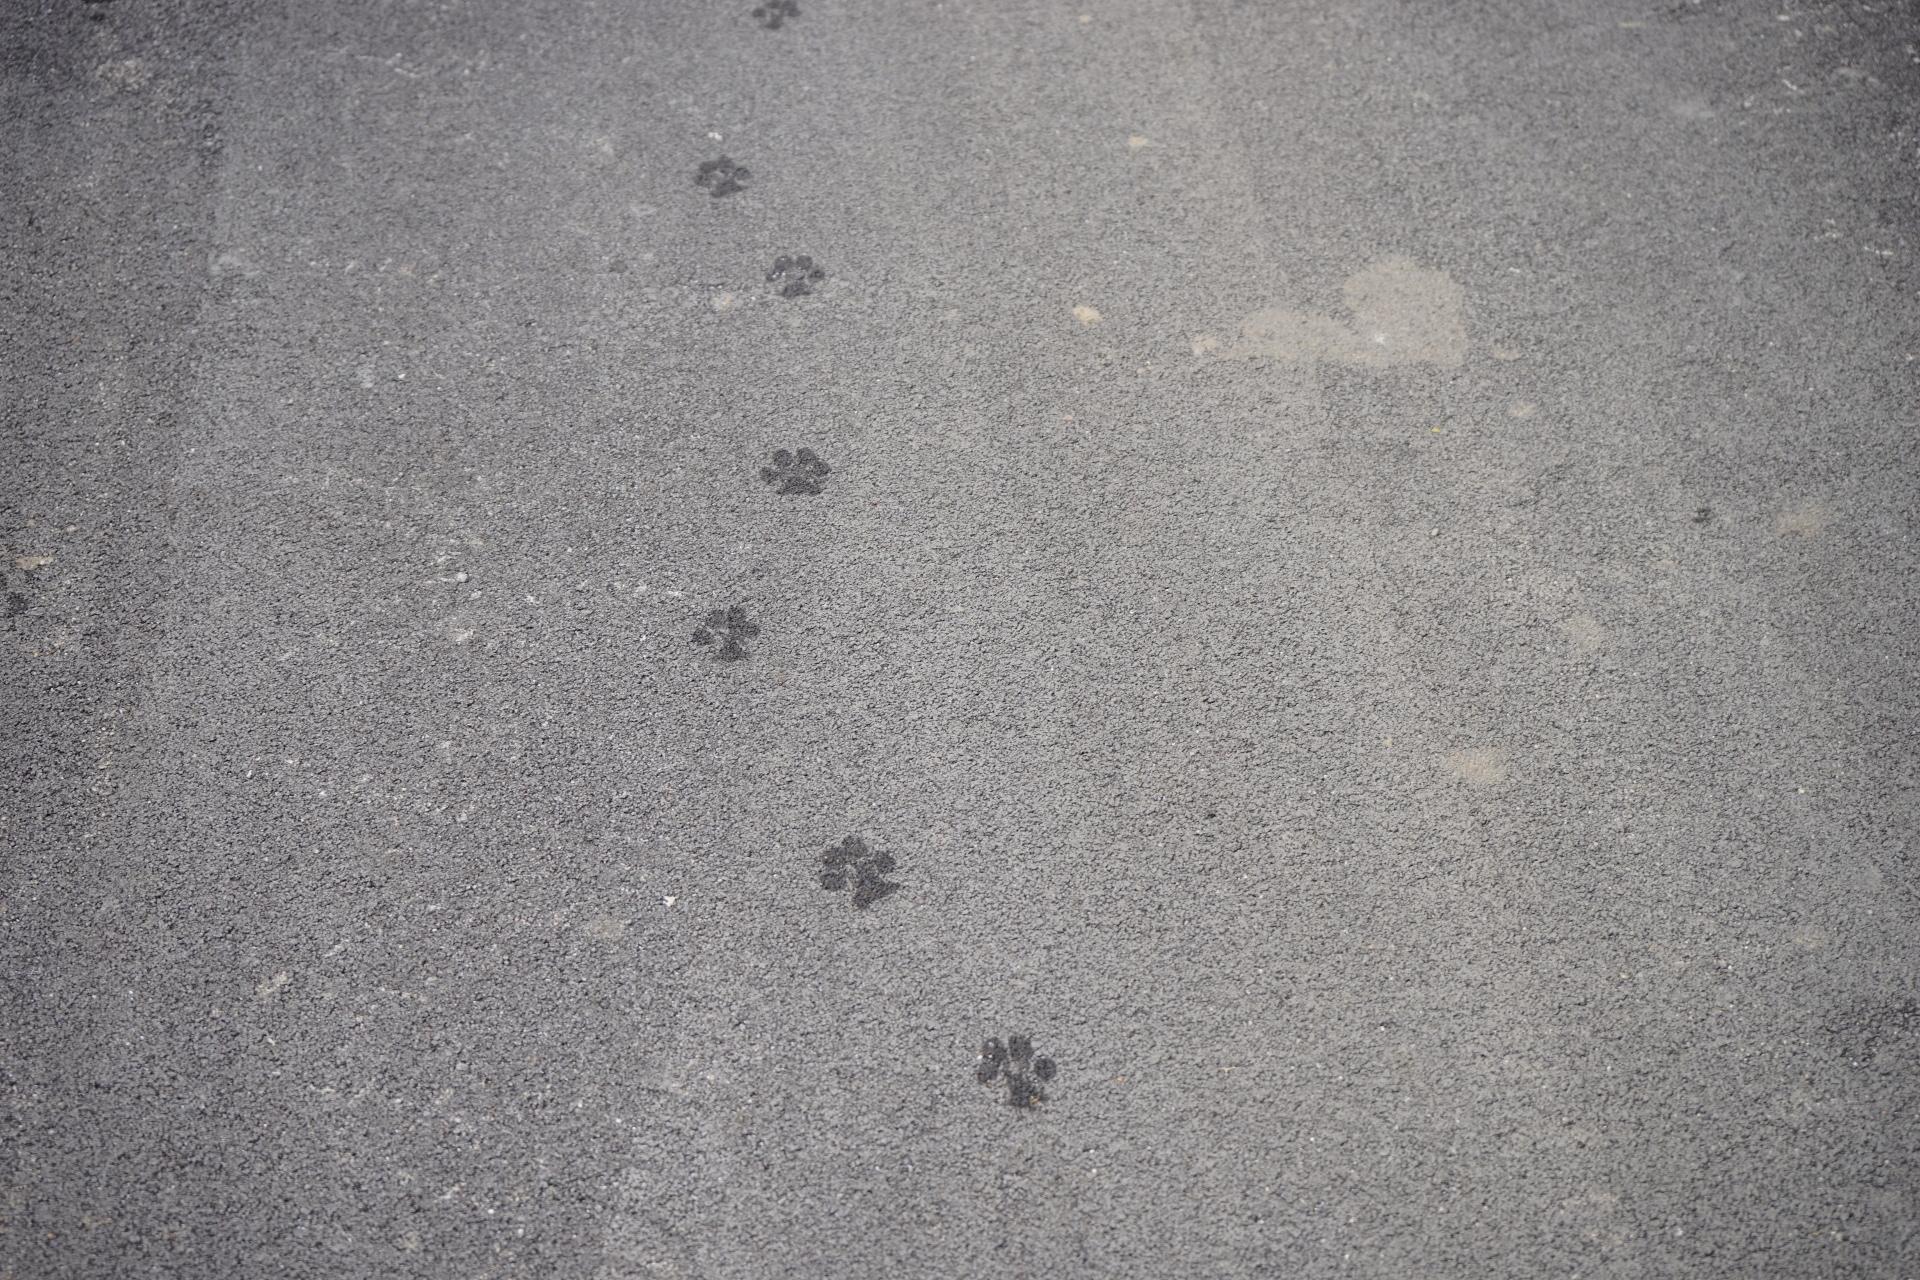 strolling...